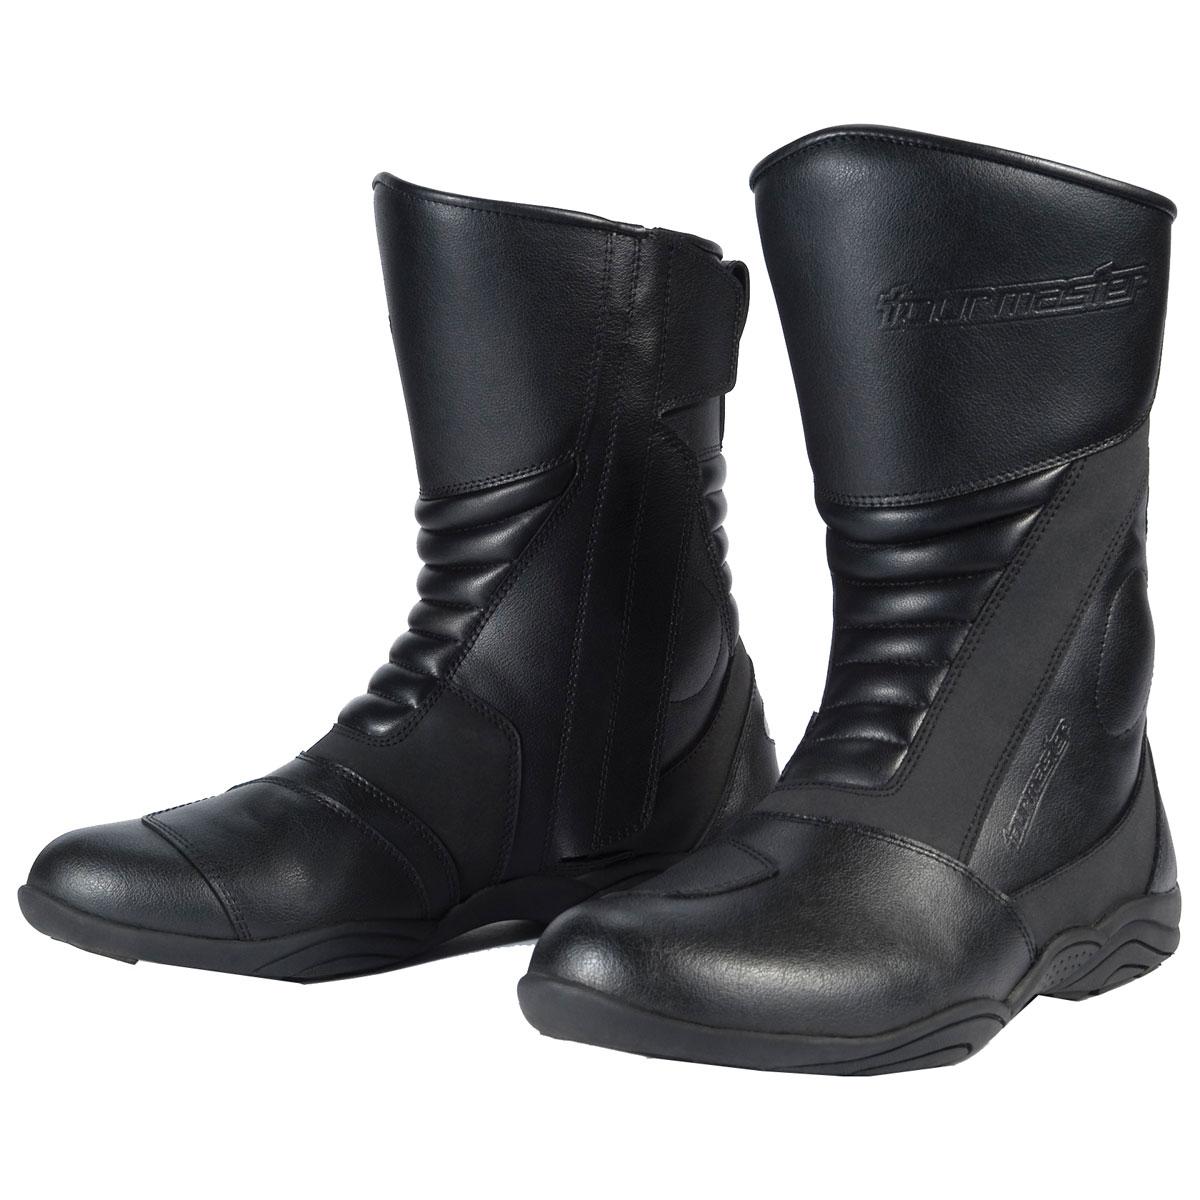 Tour Master Women's Solution Waterproof 2.0 Black Boots